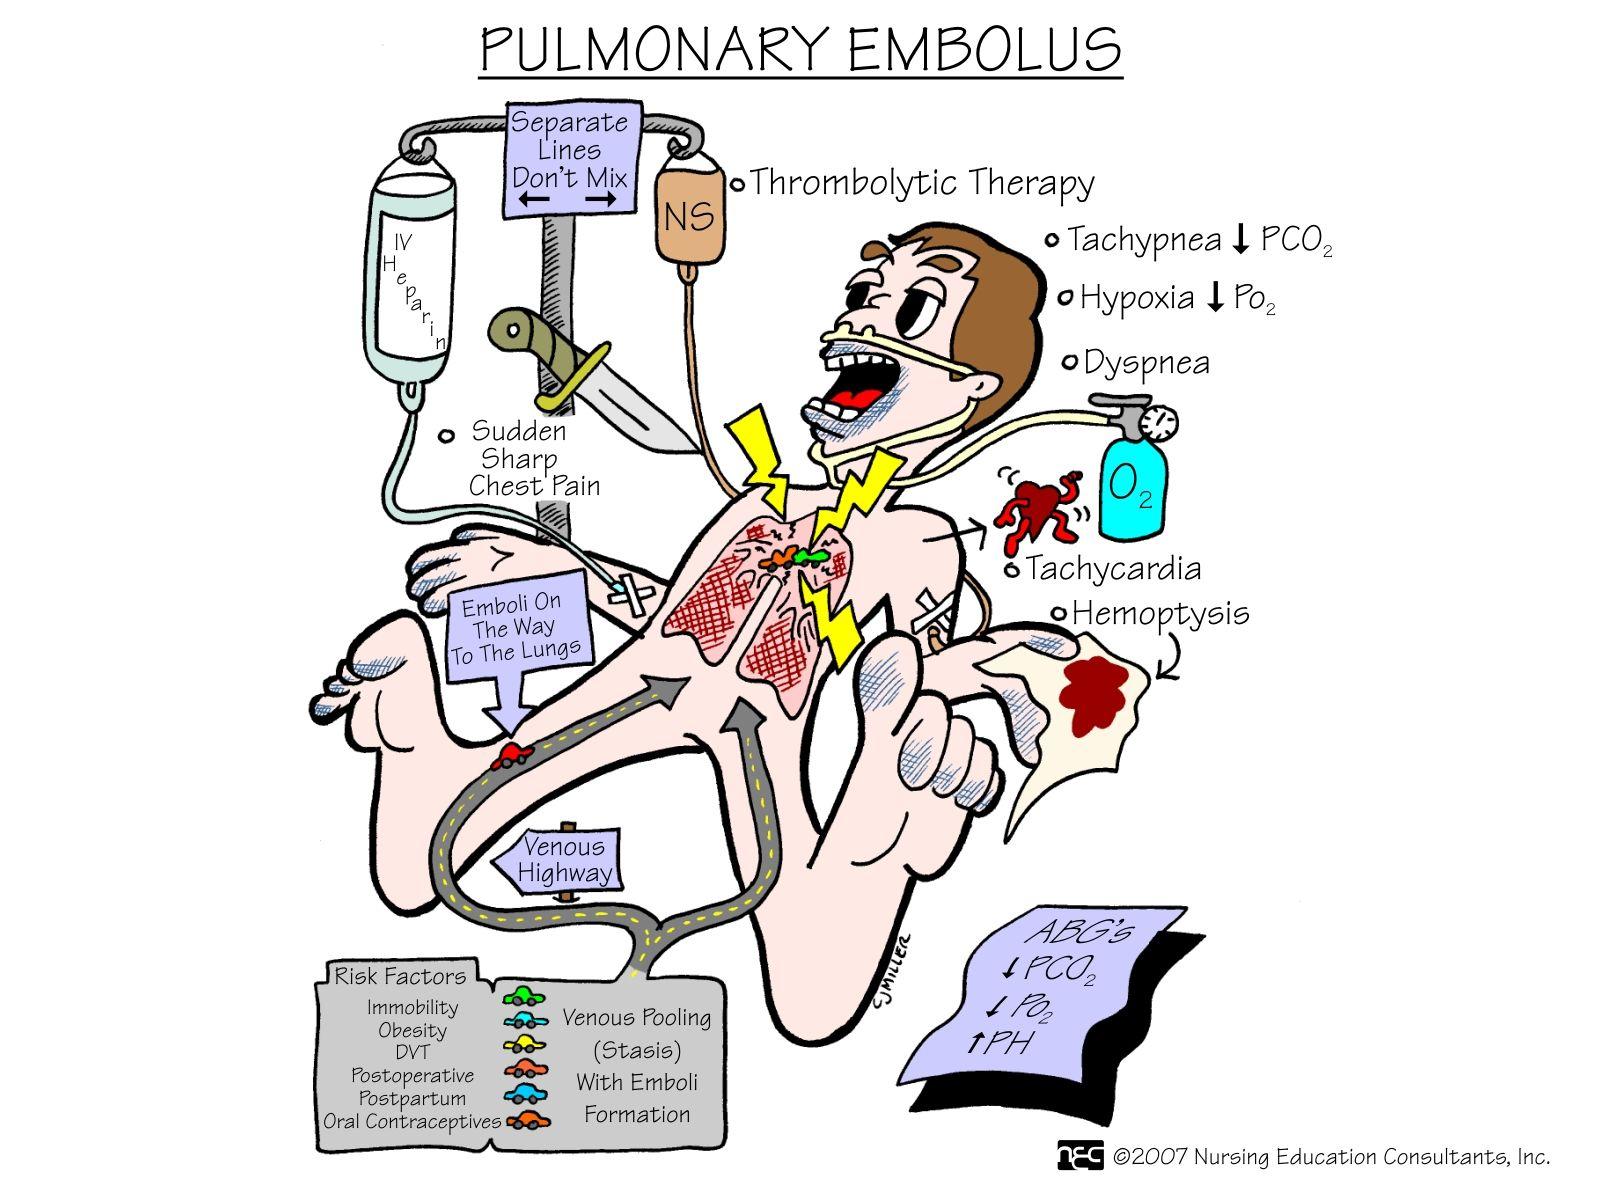 Physiology Physiology, Anatomy and physiology, Medical